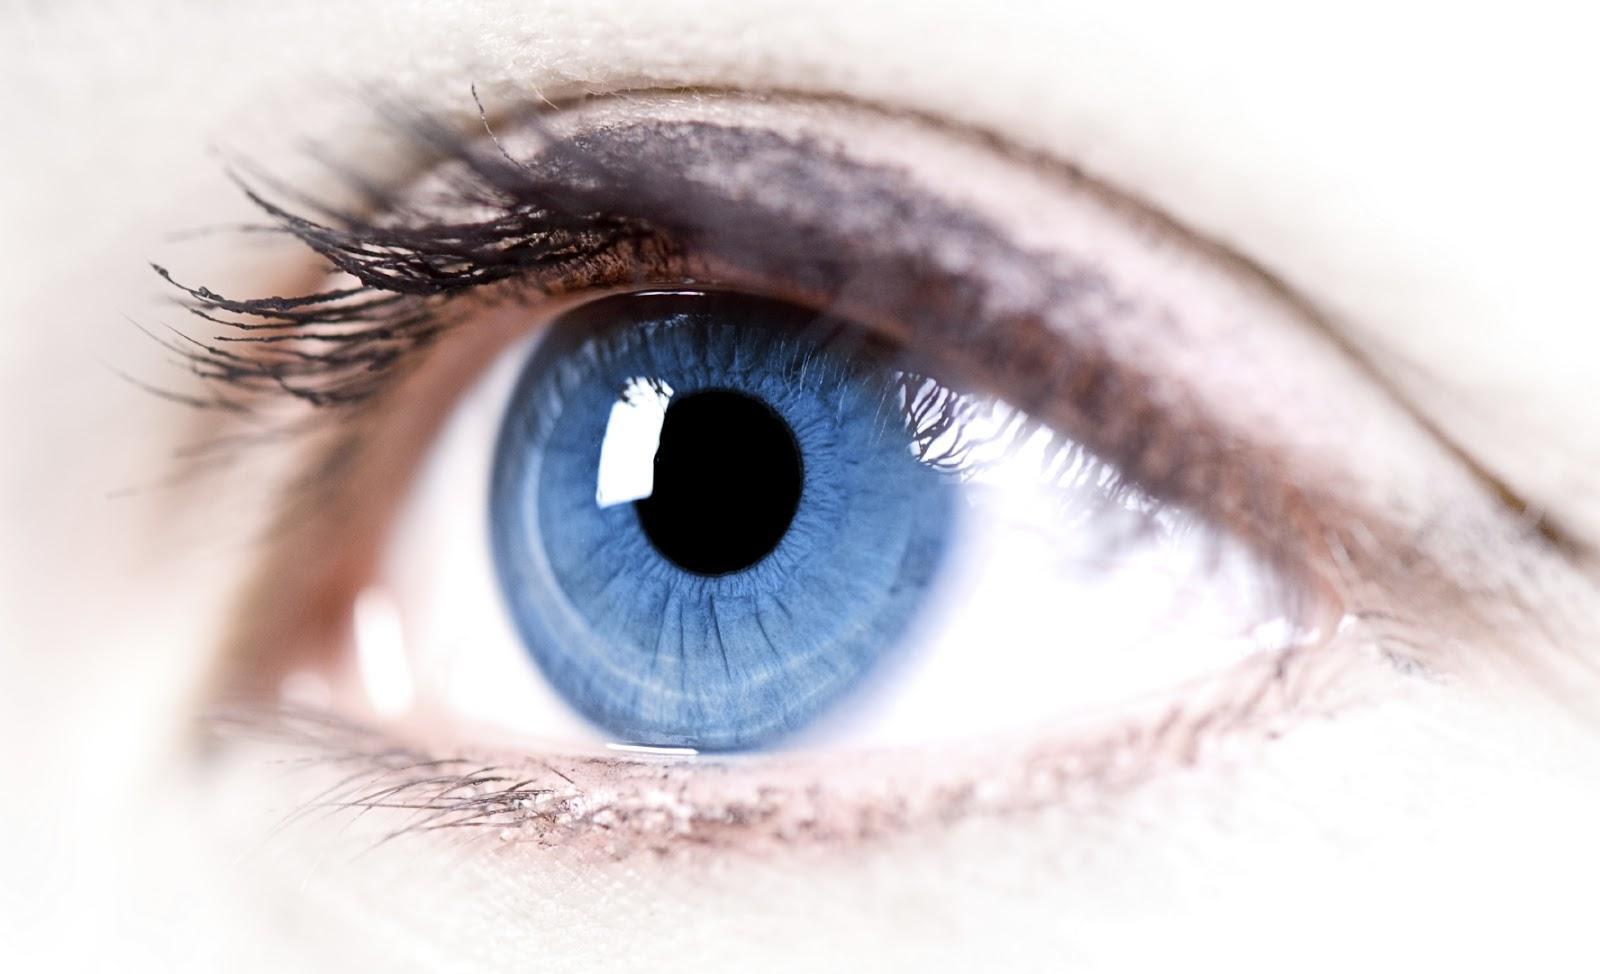 BMI Albyn Hospital Cataract Information Eveni